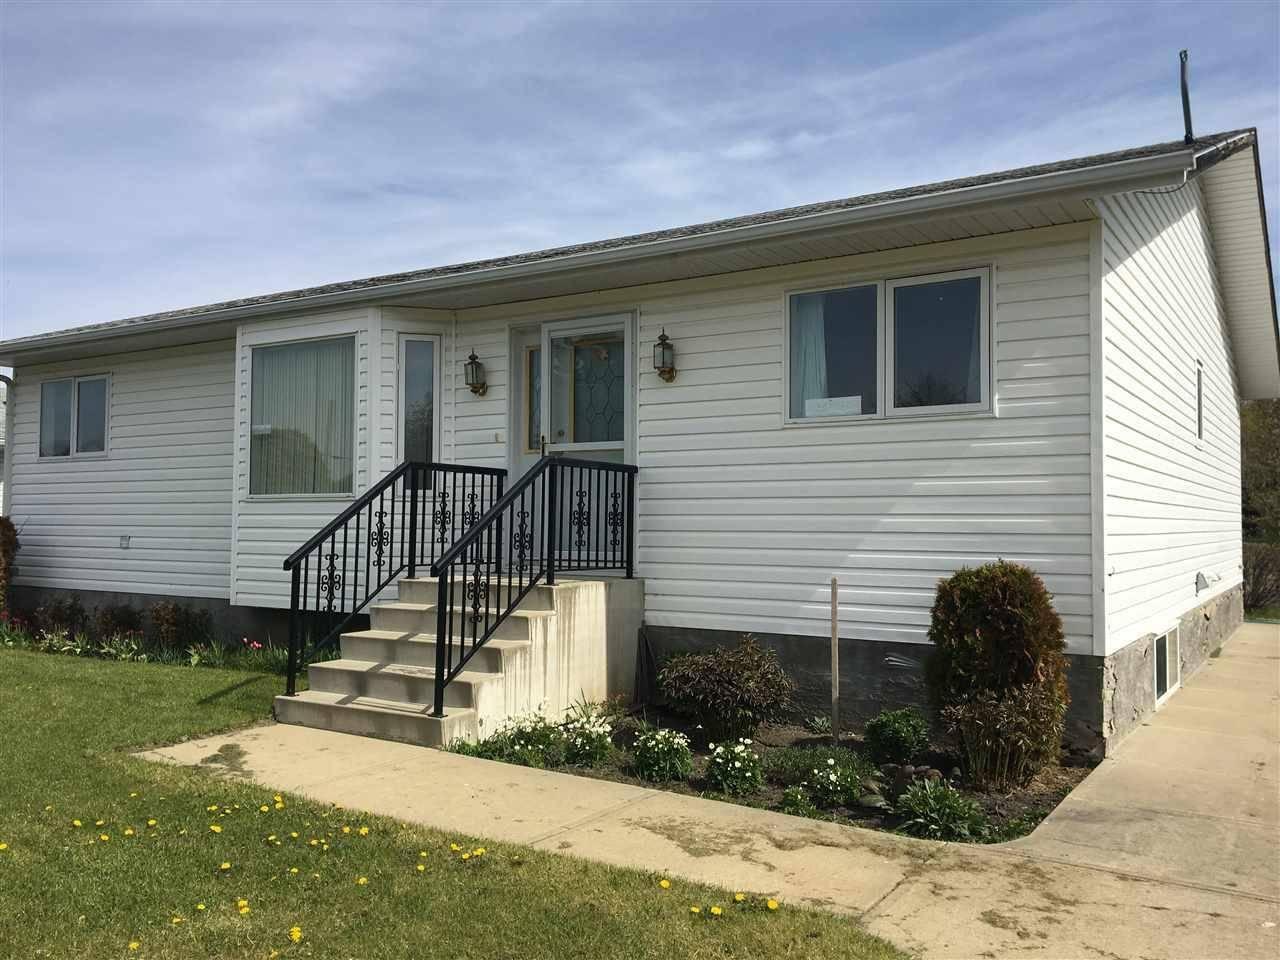 House for sale at 5232 55 Ave Mundare Alberta - MLS: E4153655